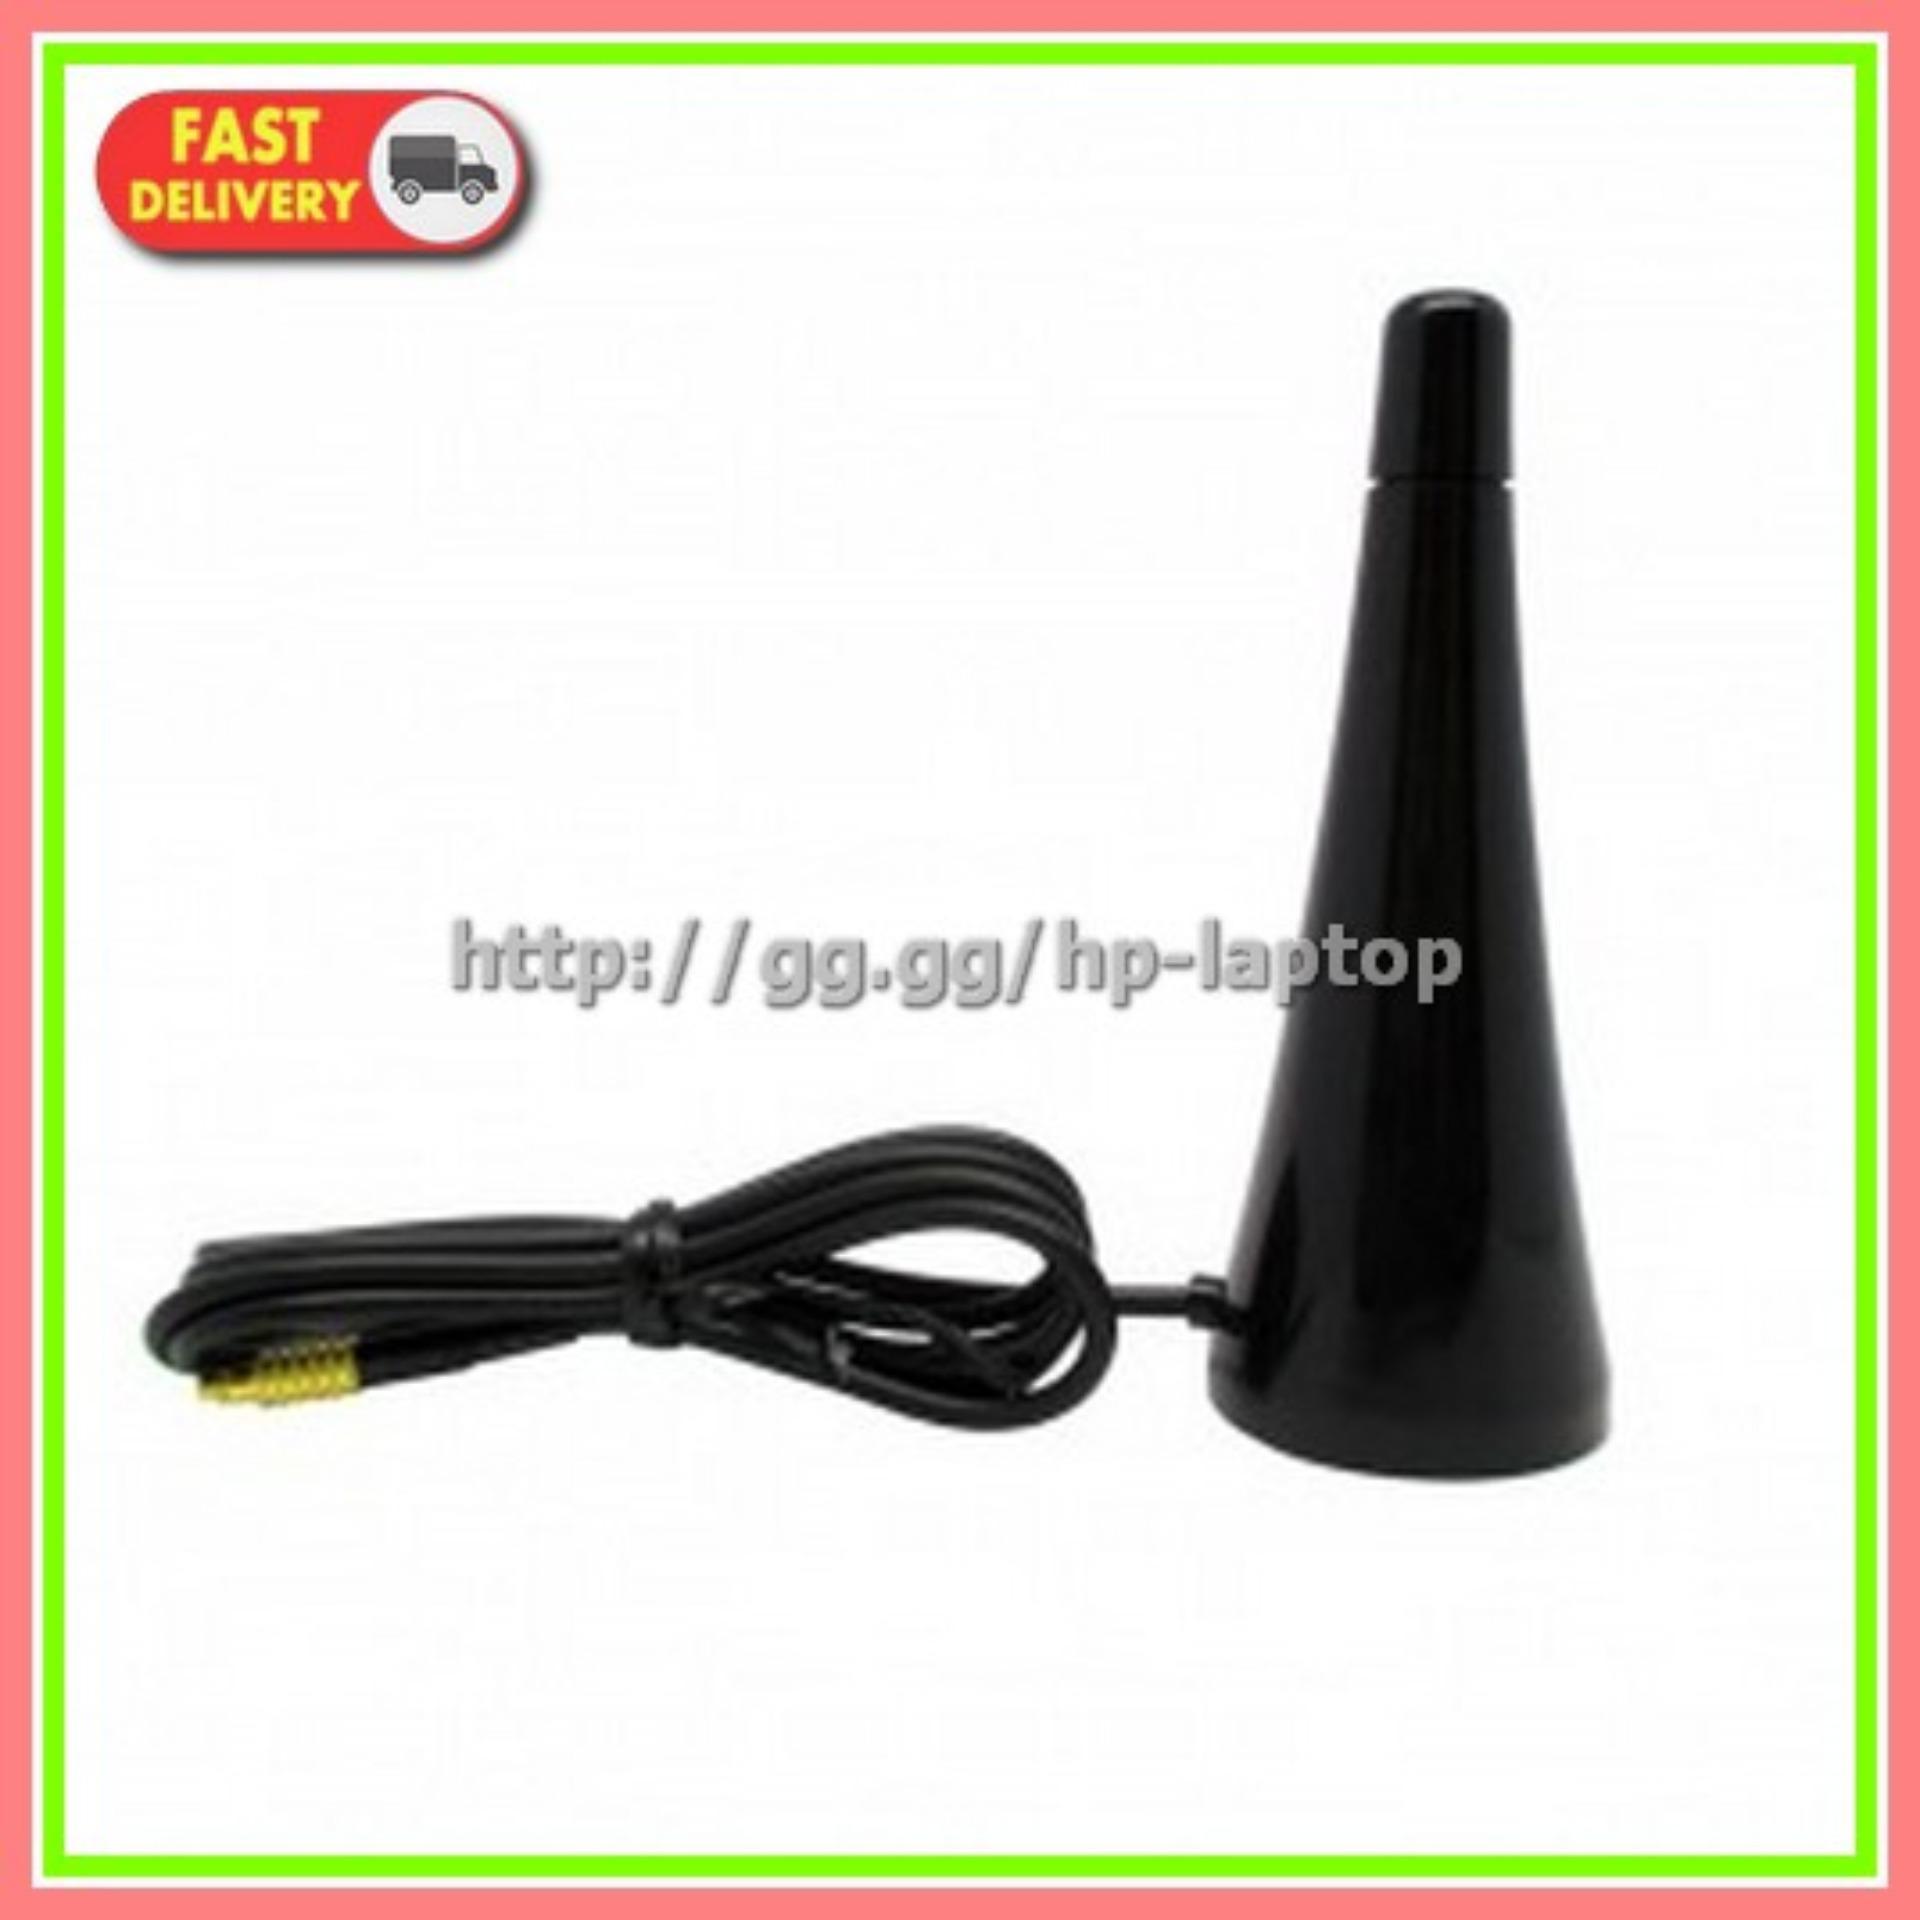 Antenna DVB-T Huawei E510 Black